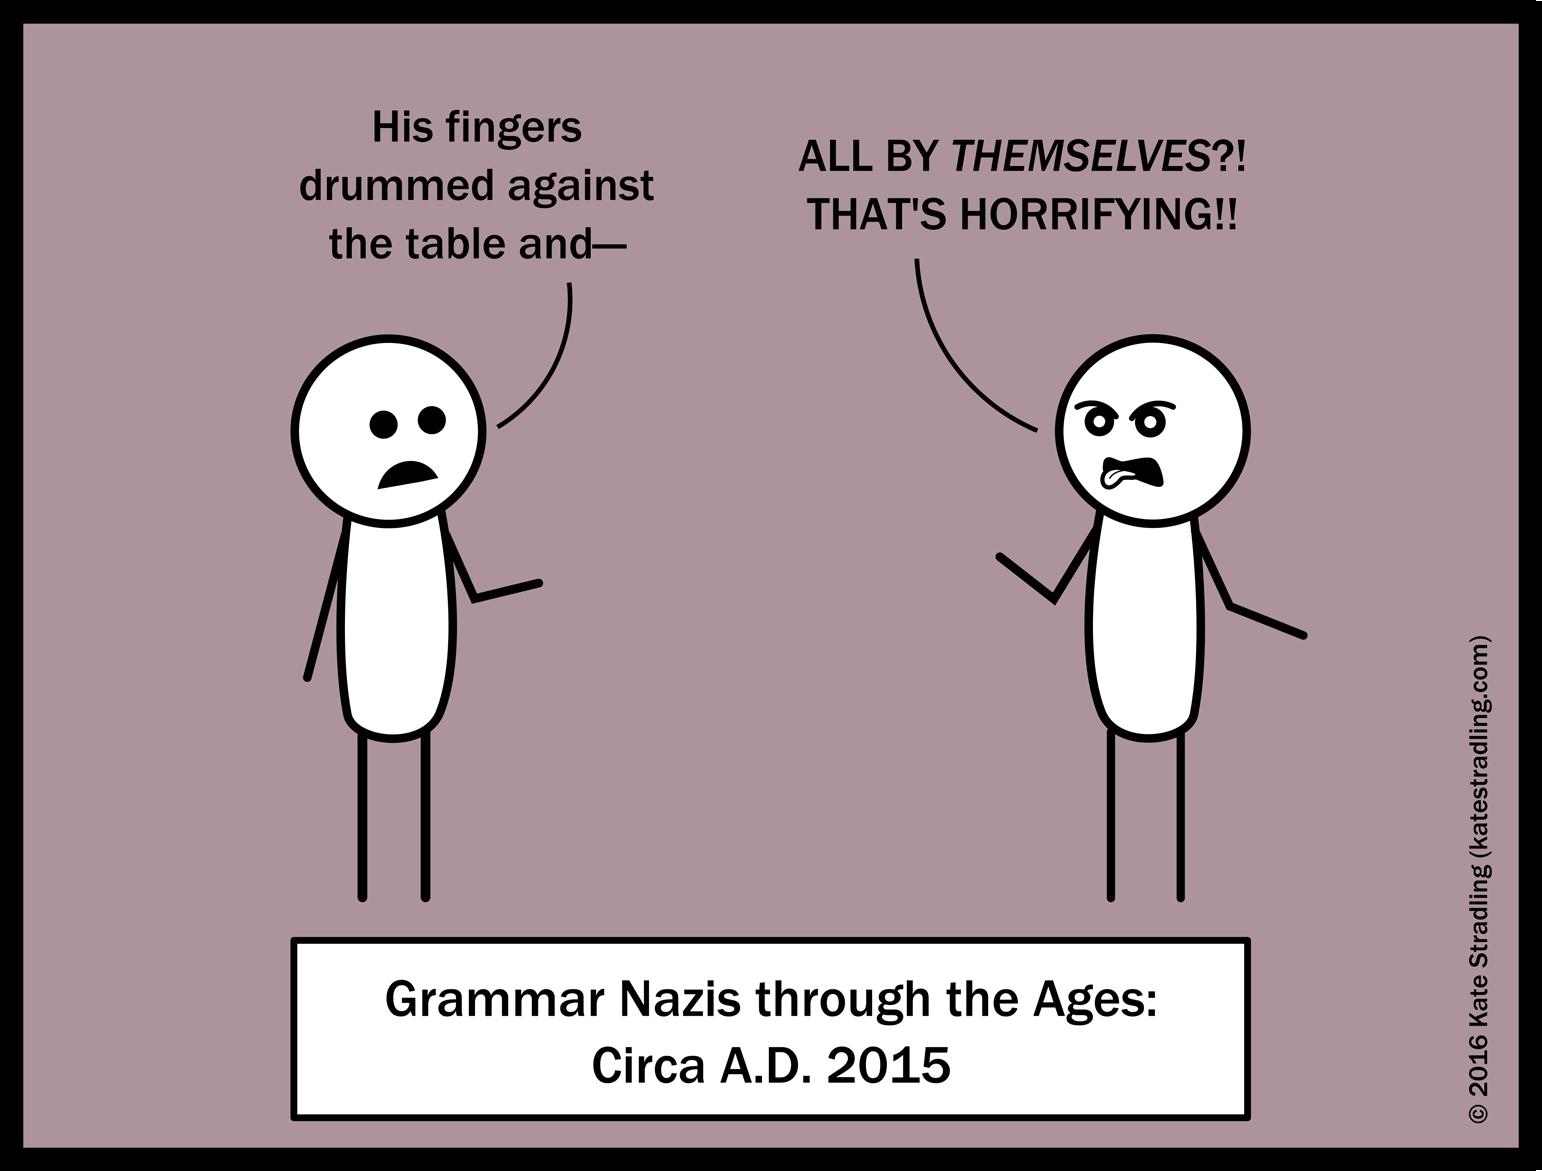 GrammarNazis_06